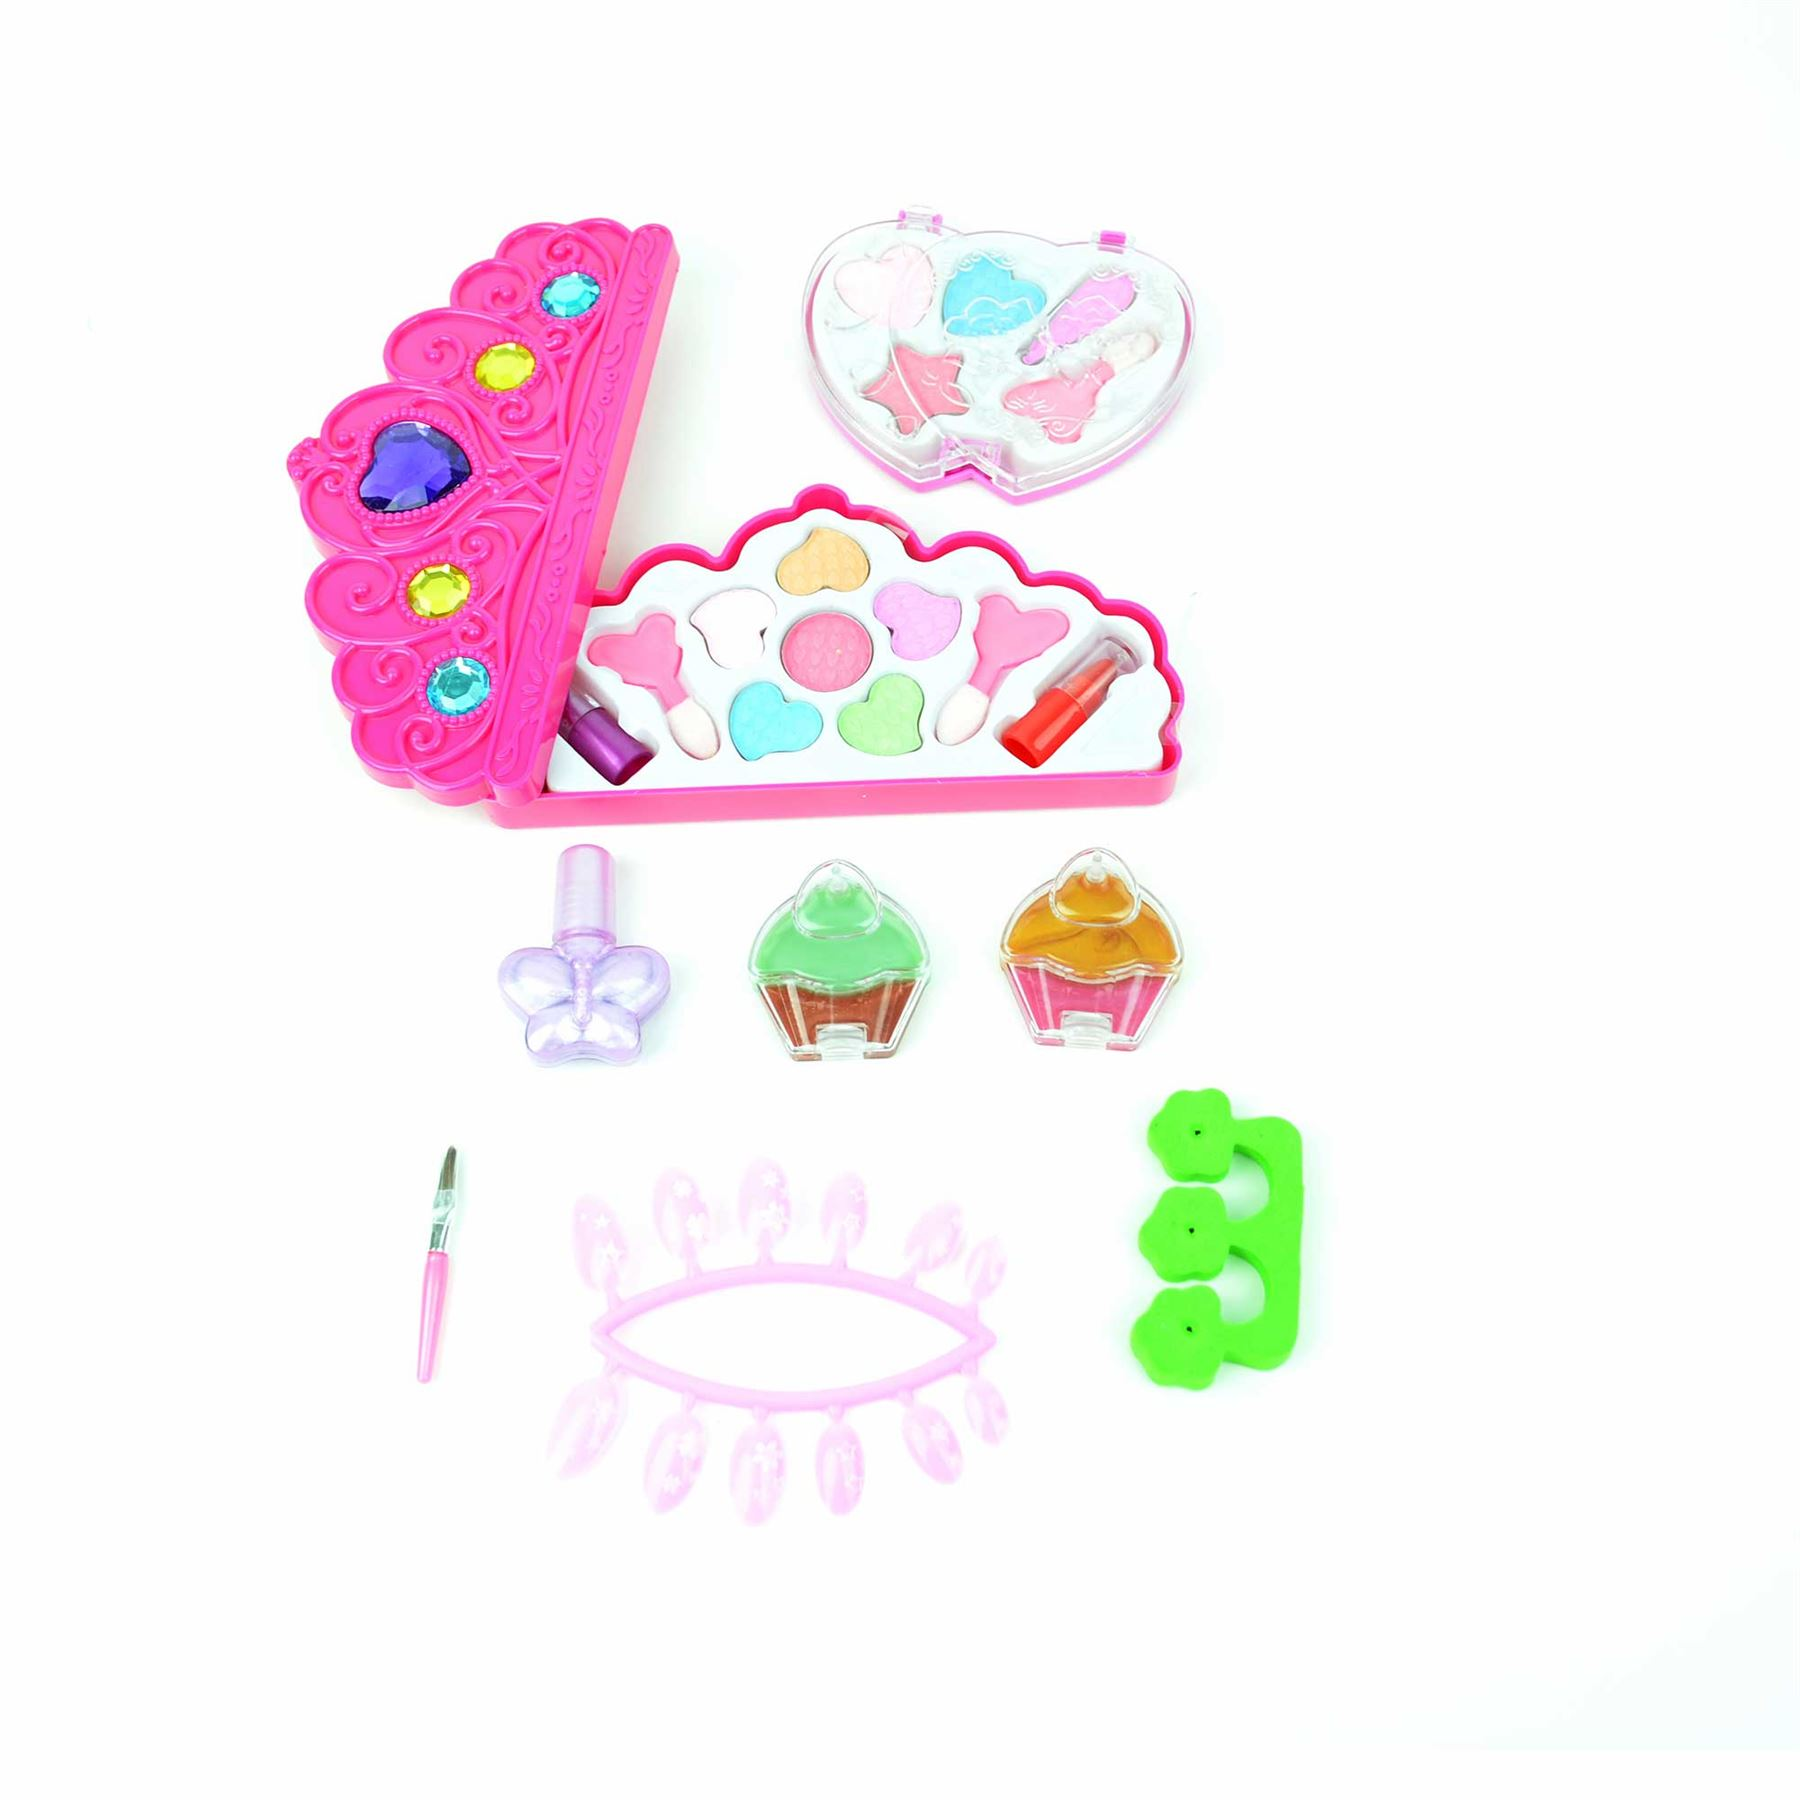 Kids Make Up Kits Girls Pink Play Set Birthday Gifts Toys Dressing Vanity Case